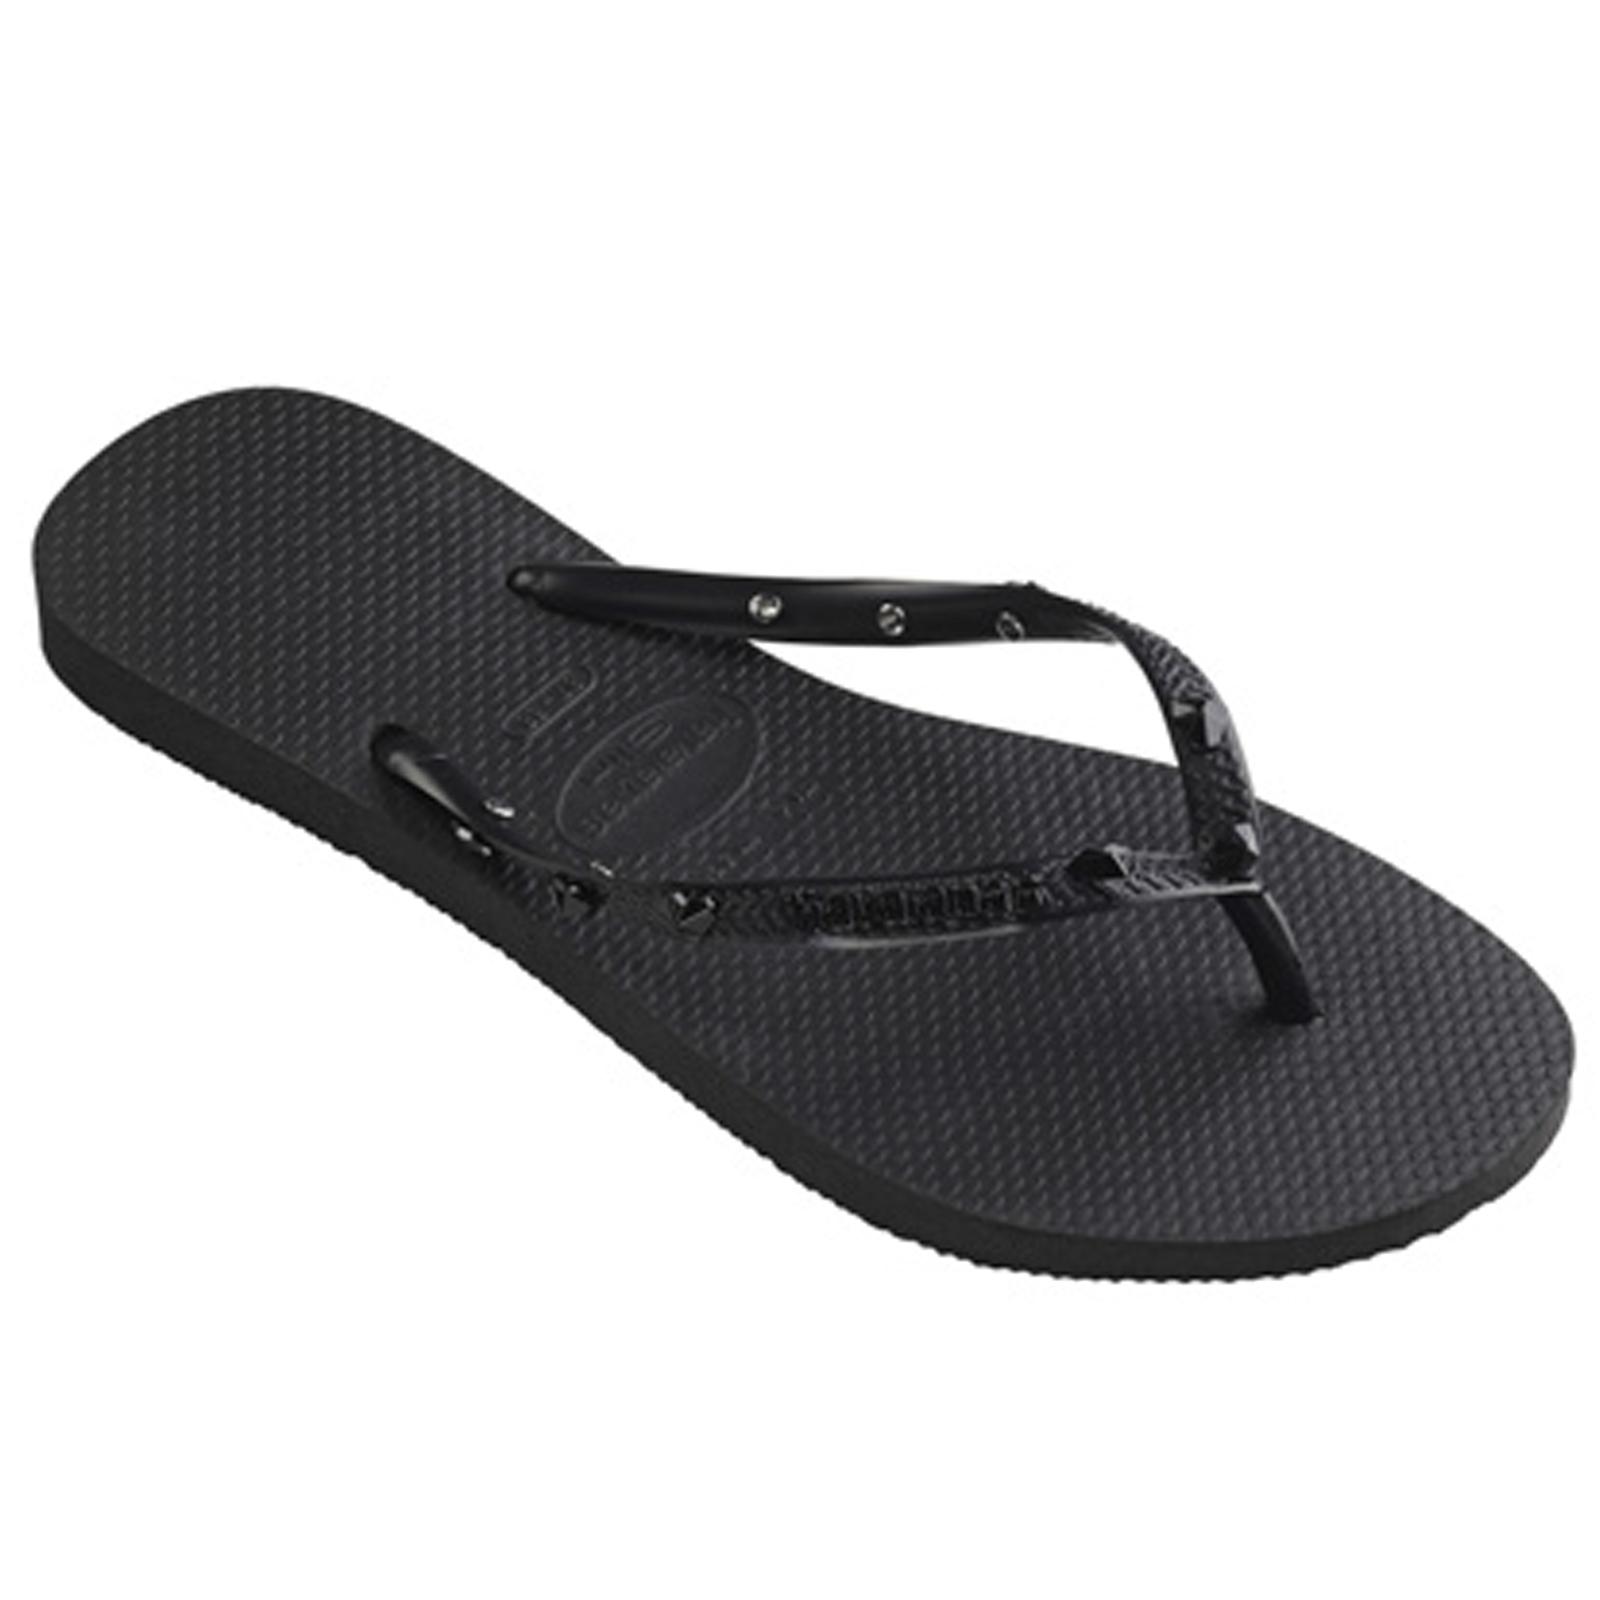 Flip-Flops Slim Hardware Black-dark Grey-dark Grey - Brand Havaianas 911d7990cd4e